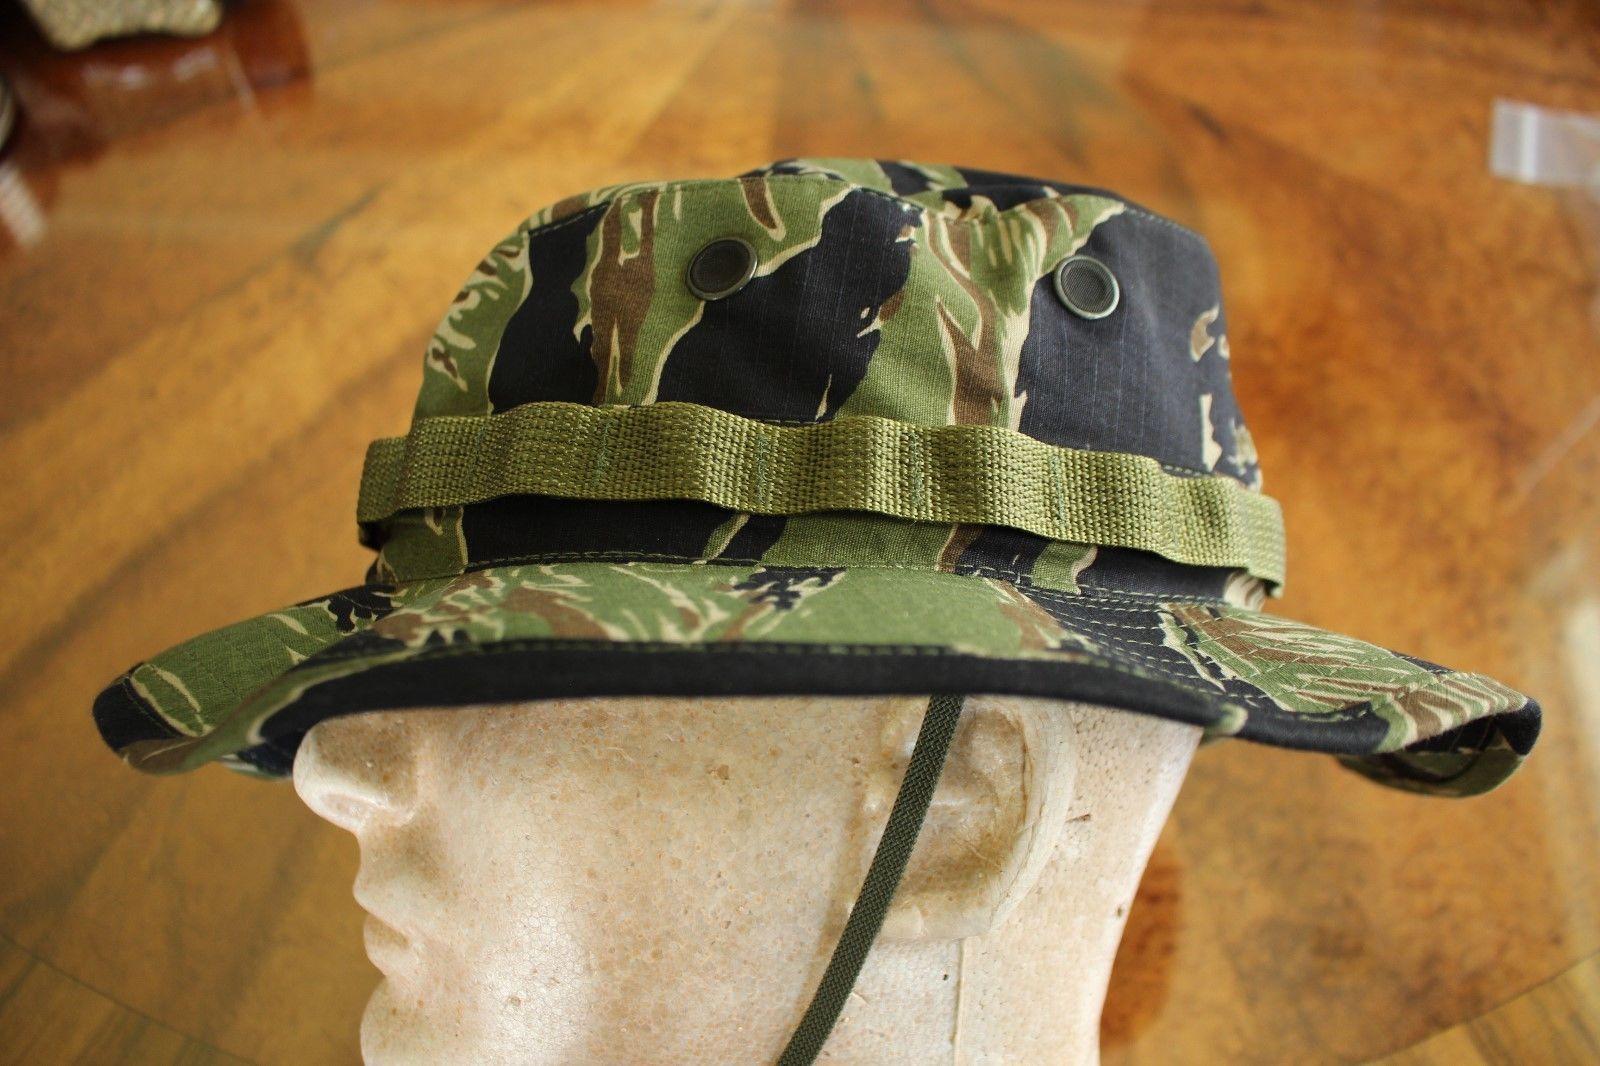 e1b919e3418 US ARMY TIGER STRIPE VIETNAM BDU RIPSTOP CAMO UNIFORM FLOPPY HAT BOONIE CAP  7.0